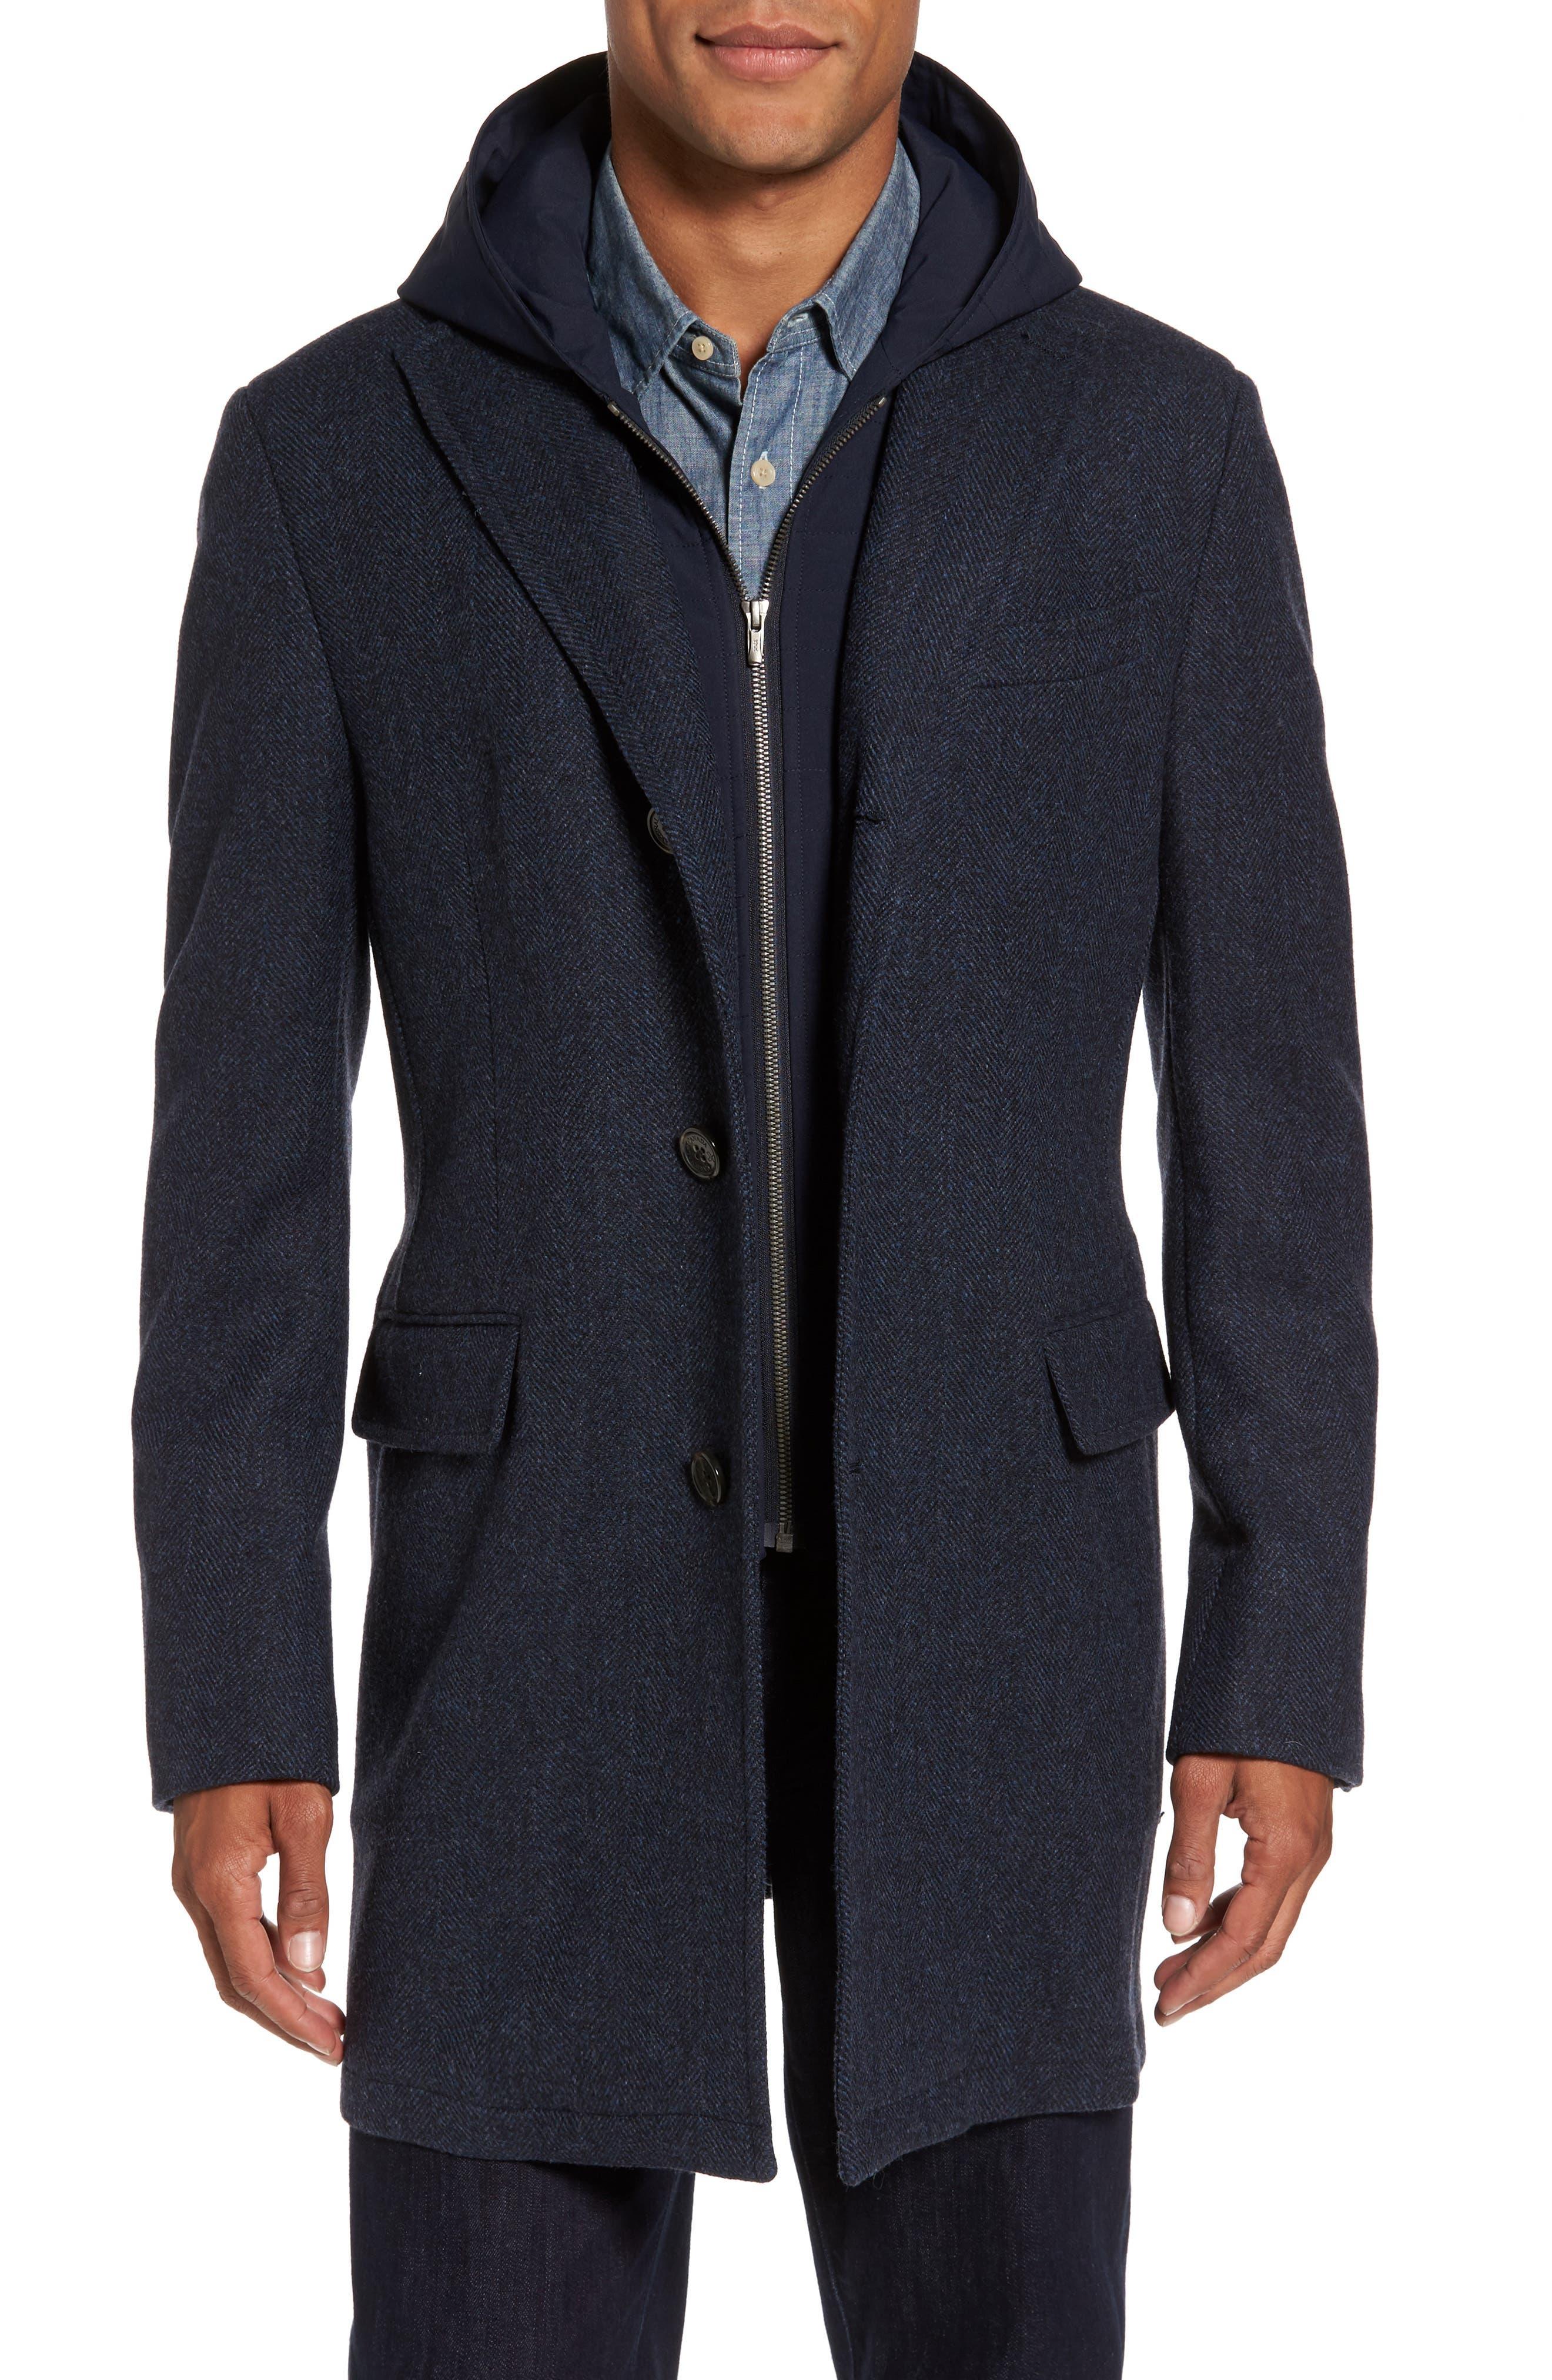 mens brown wool trench coat tradingbasis